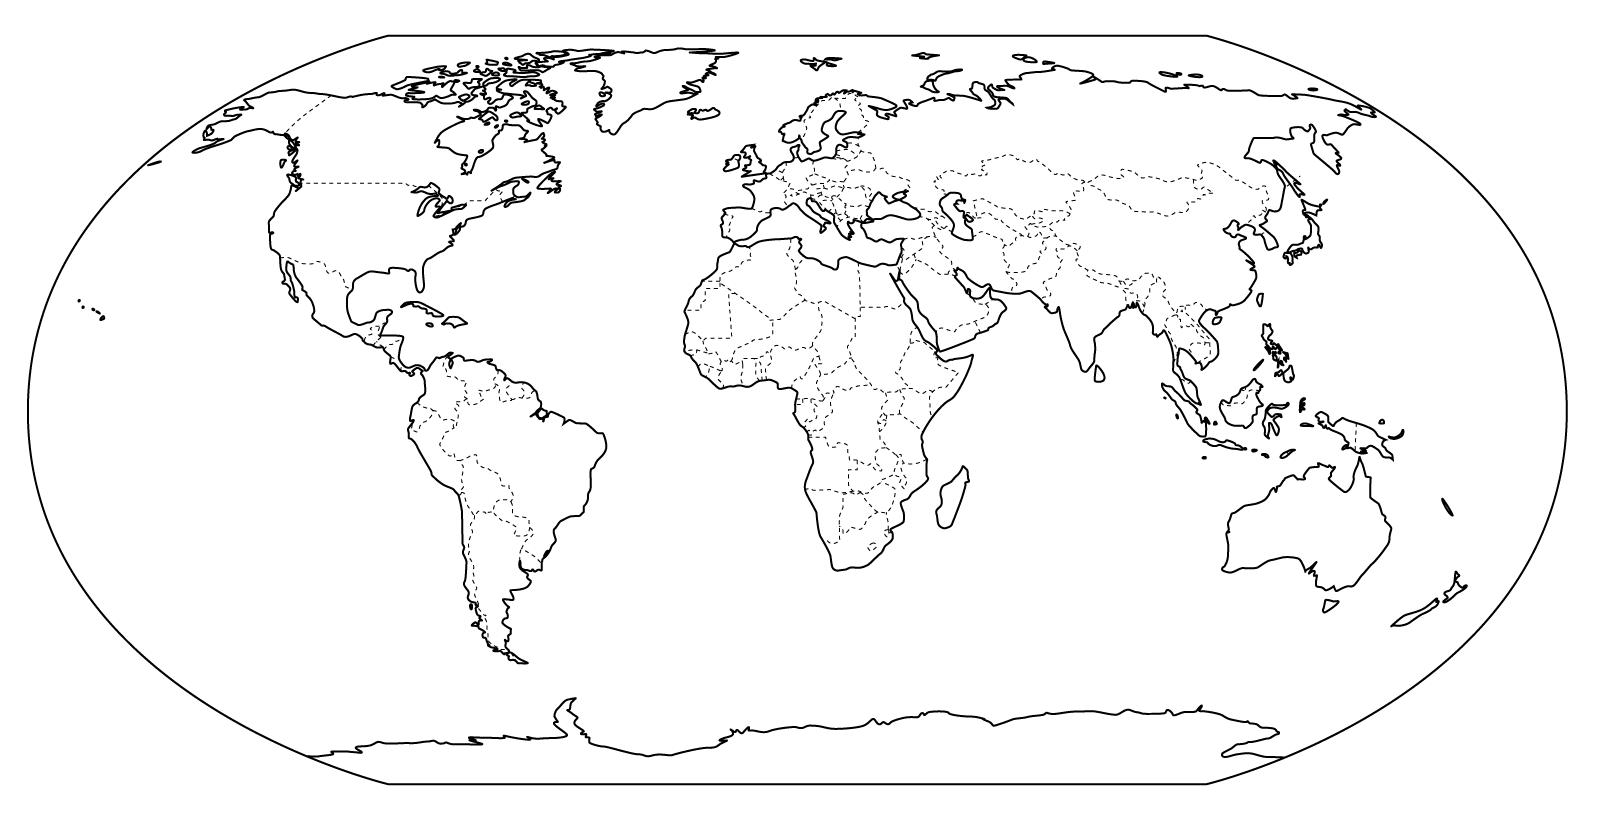 Mapa Del Mundo Para Dibujar: Planisferio Division Politica + Antiguo + Dibujo Lineal